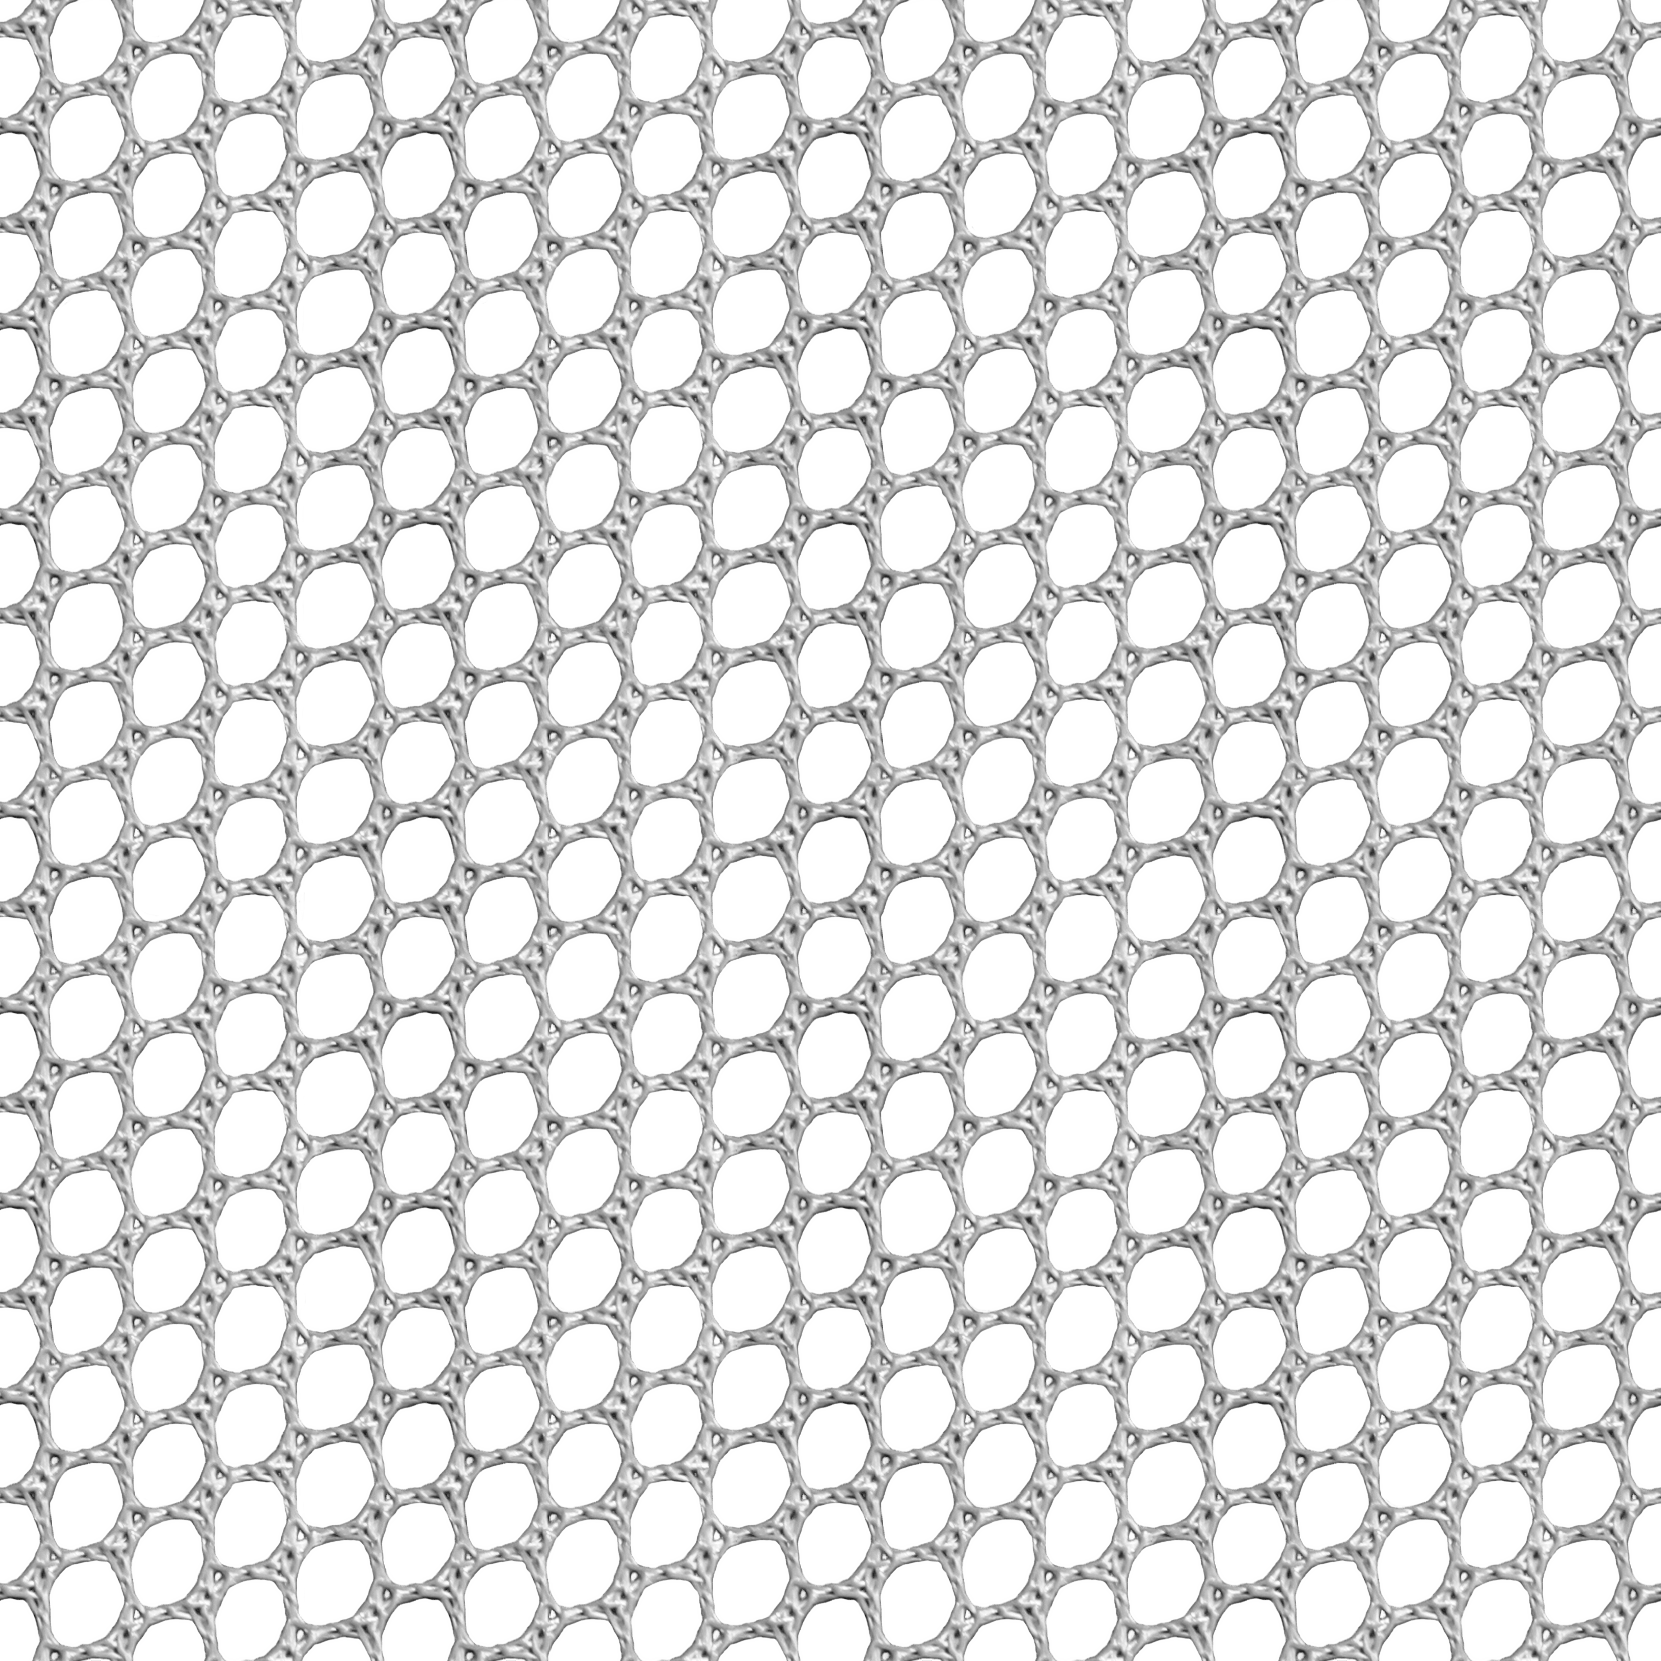 Free Plastic Tent Mesh Seamless Texture Seamless Textures Texture Geometric Pattern